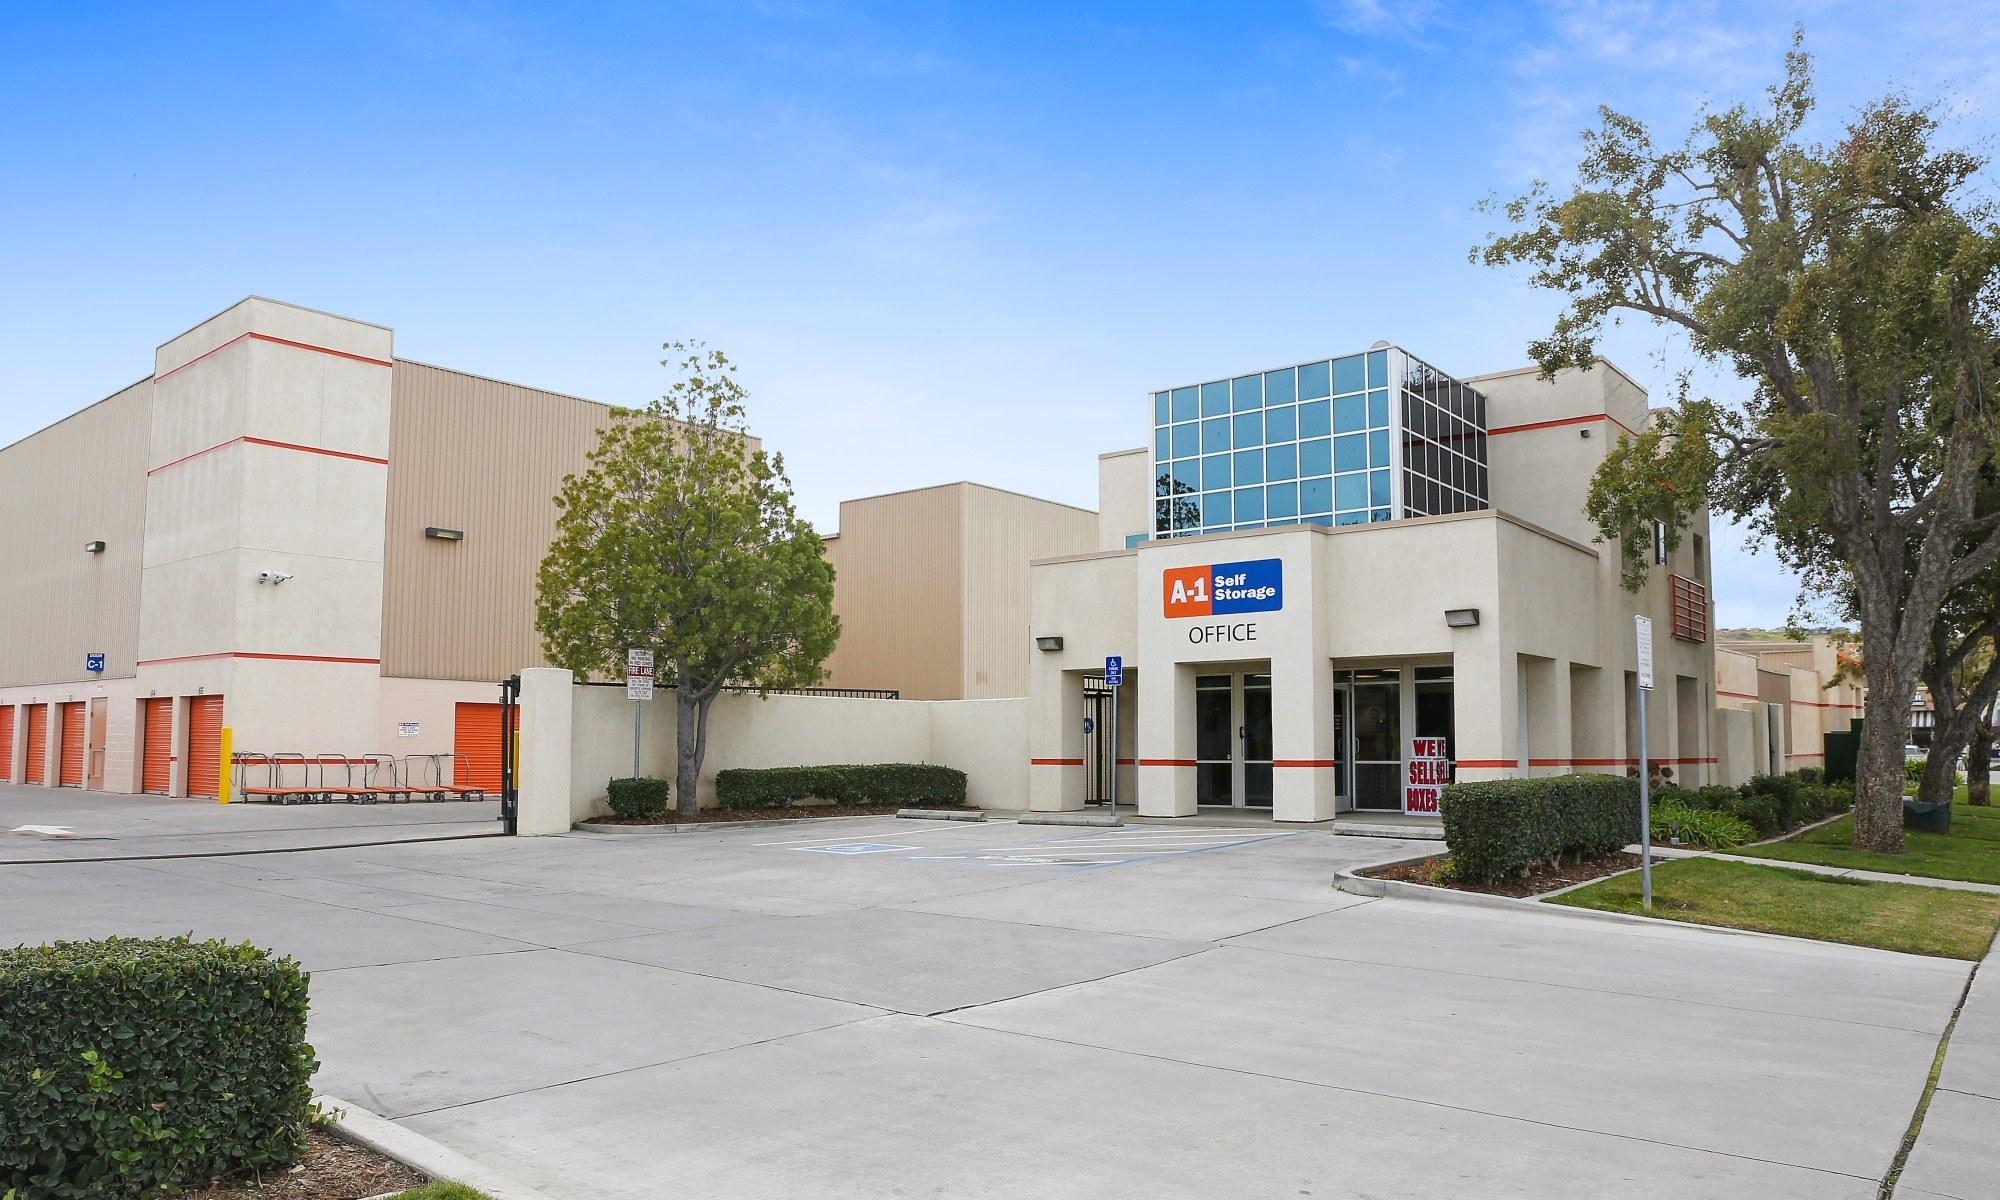 Self storage in San Jose CA